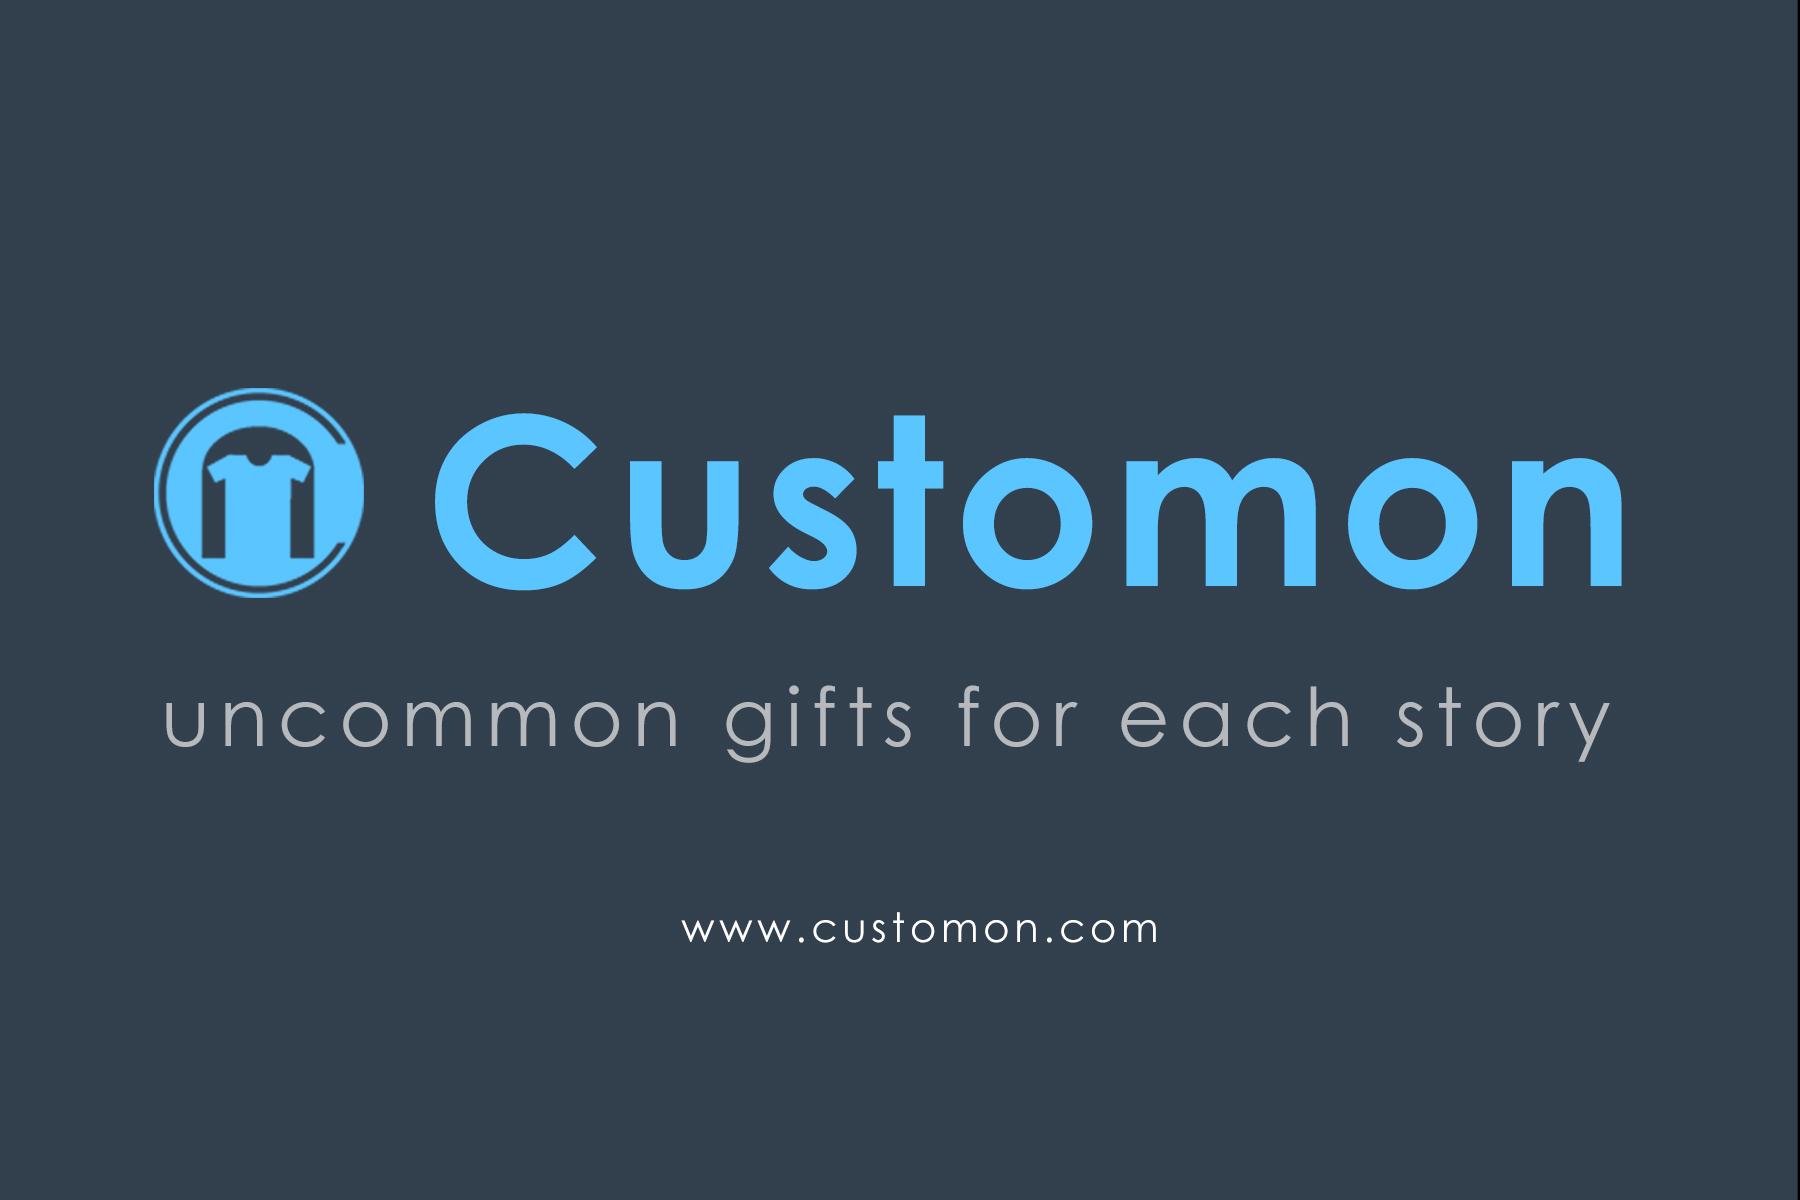 Customon - Custom T-shirts and Apparels